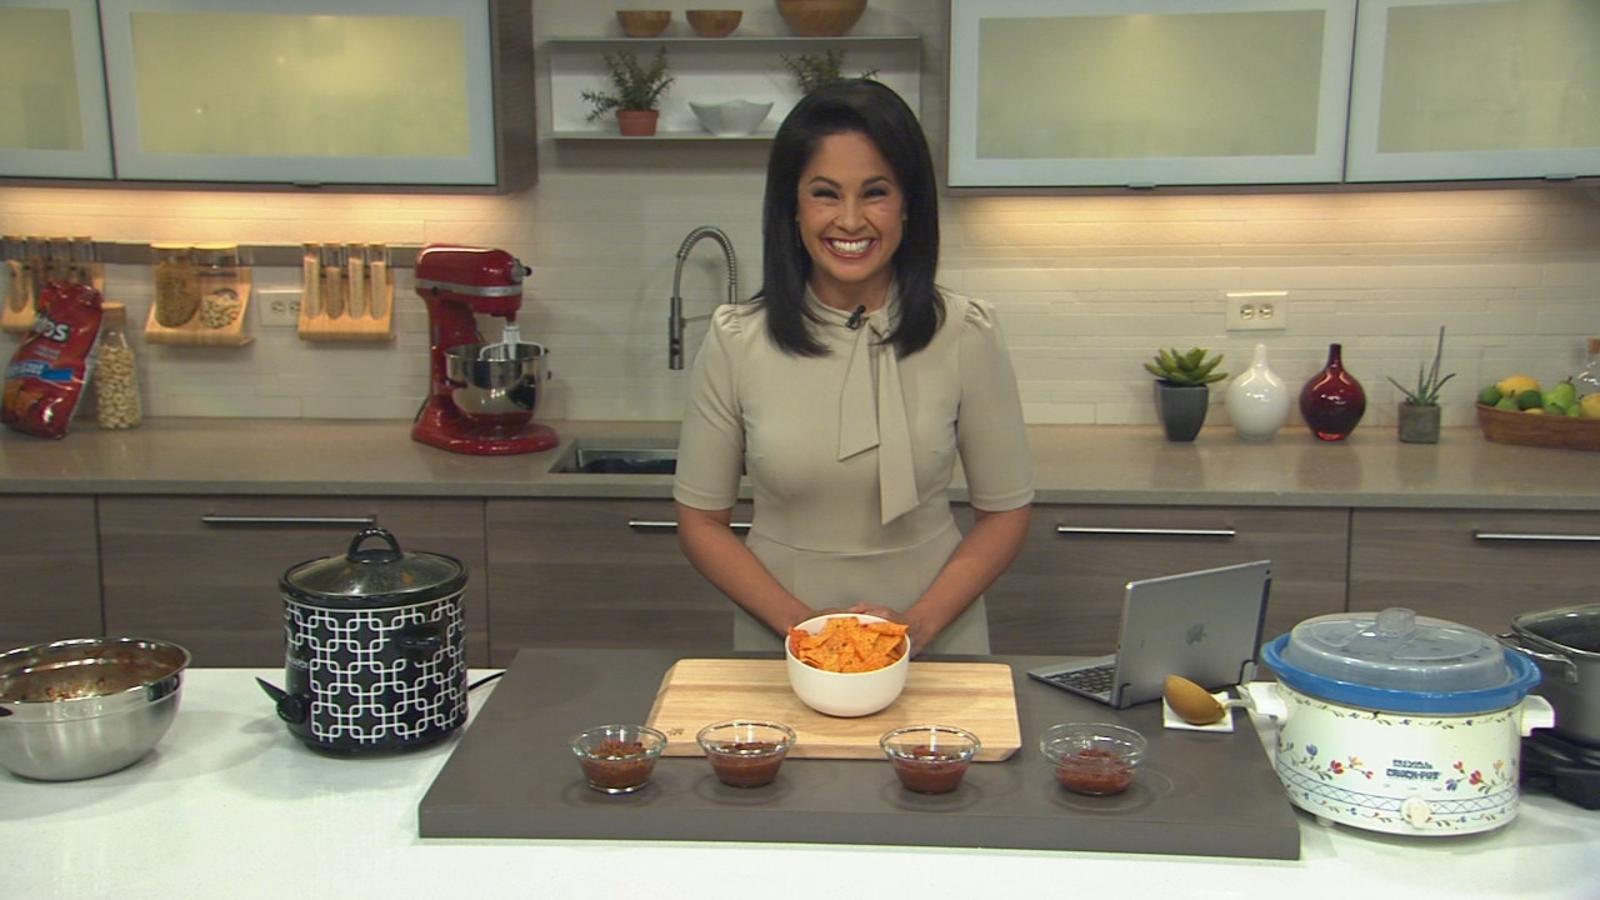 Vegan chili recipe puts healthy spin on classic fall food